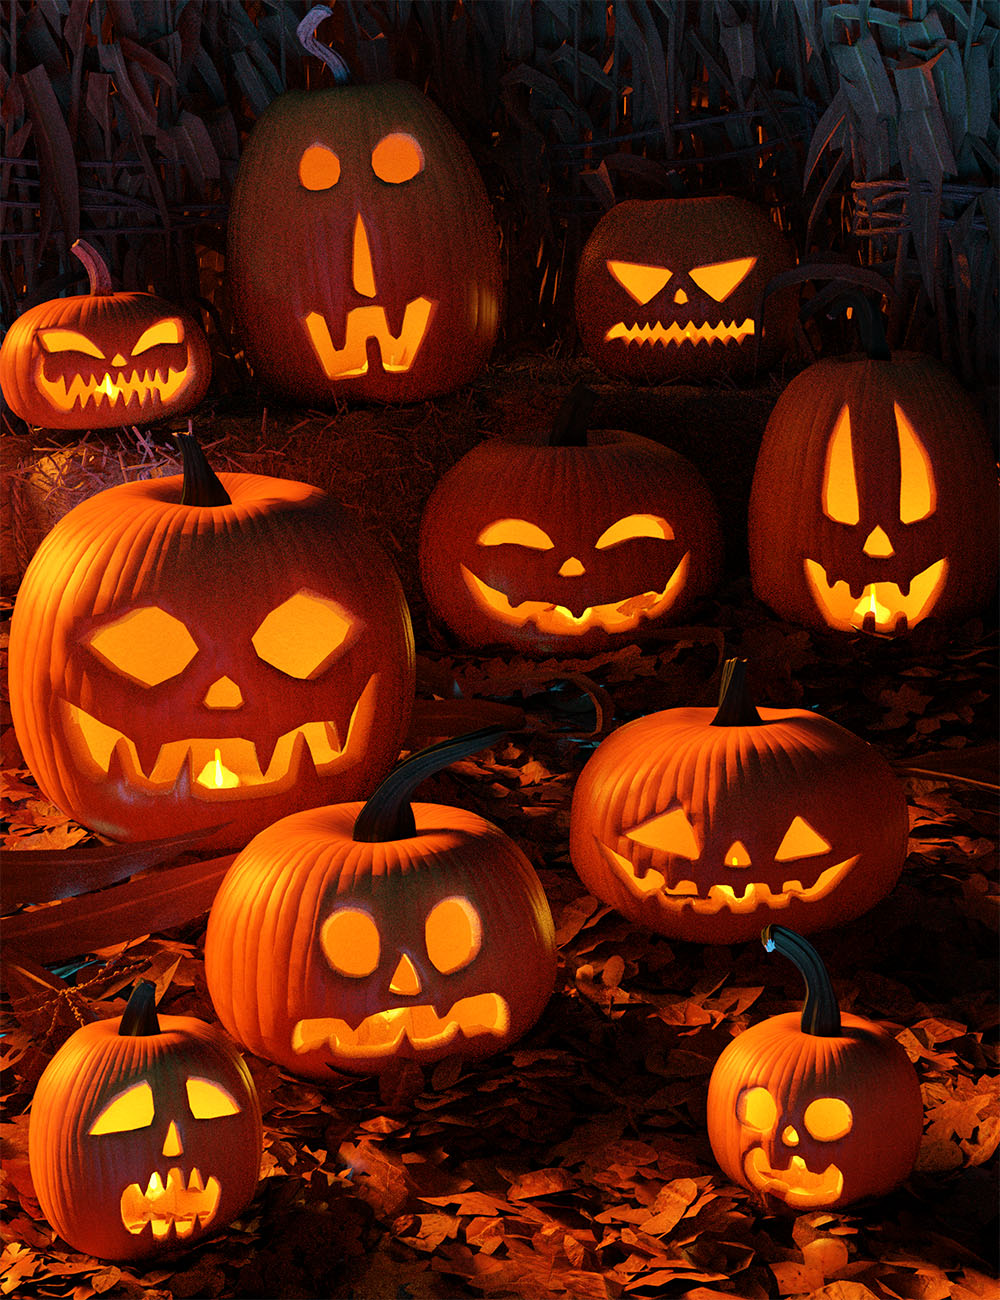 Halloween Jack O Lanterns by: Orestes Graphics, 3D Models by Daz 3D